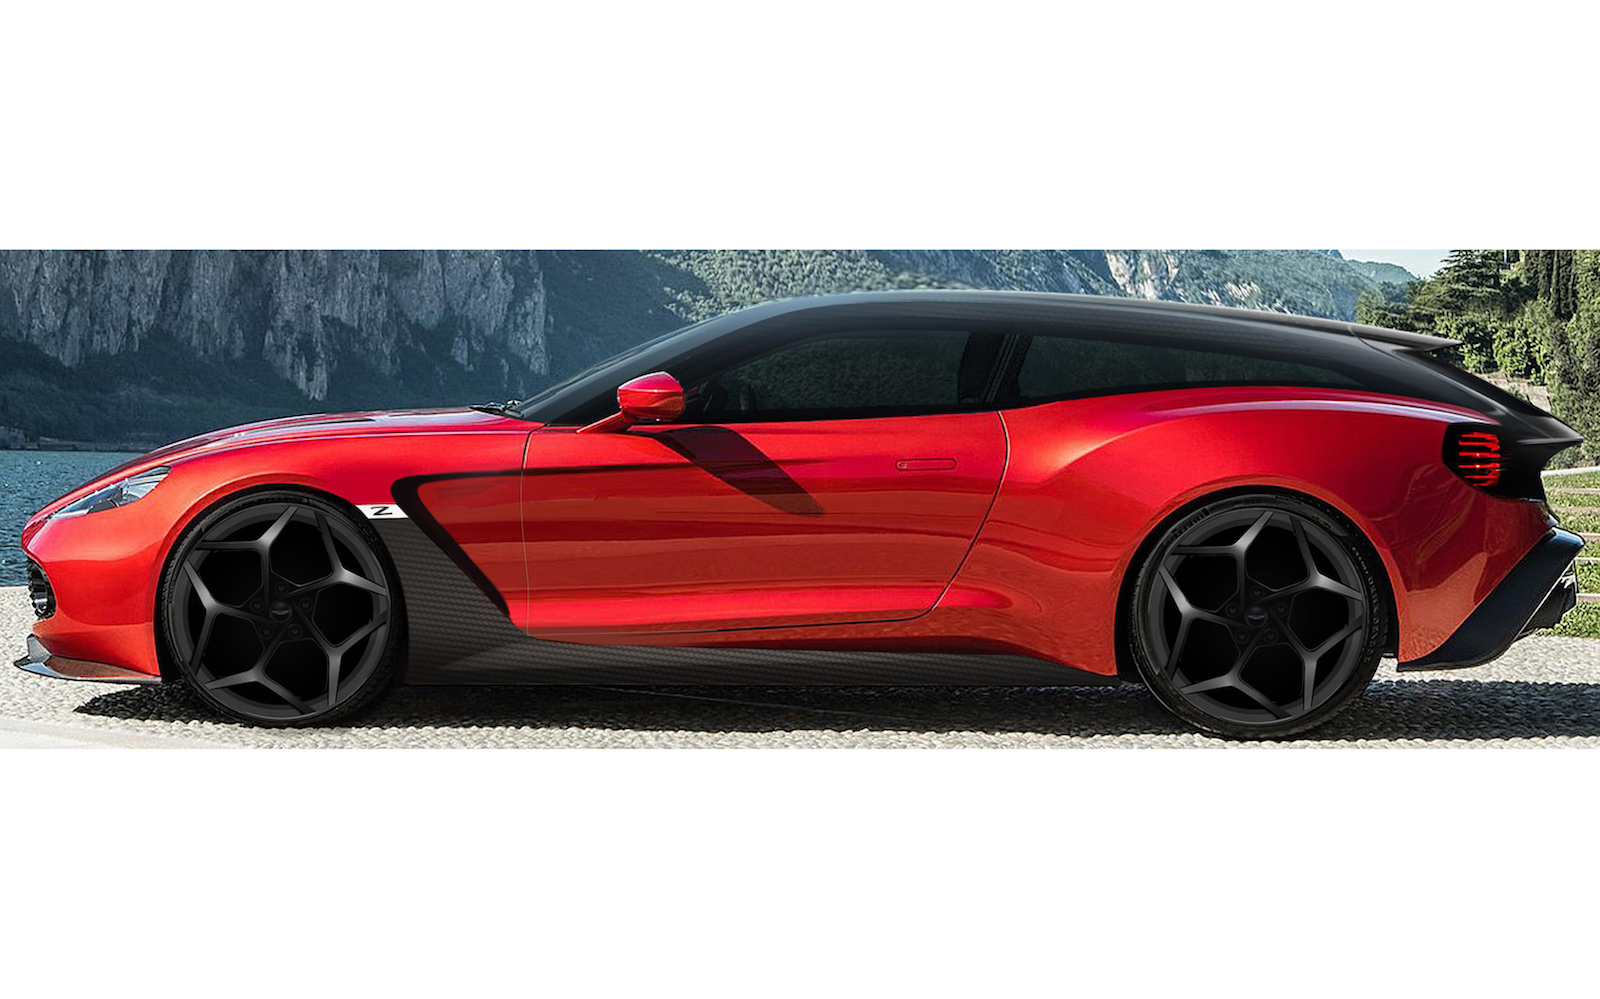 Aston Martin Vanquish Zagato Speedster and Shooting Brake debut